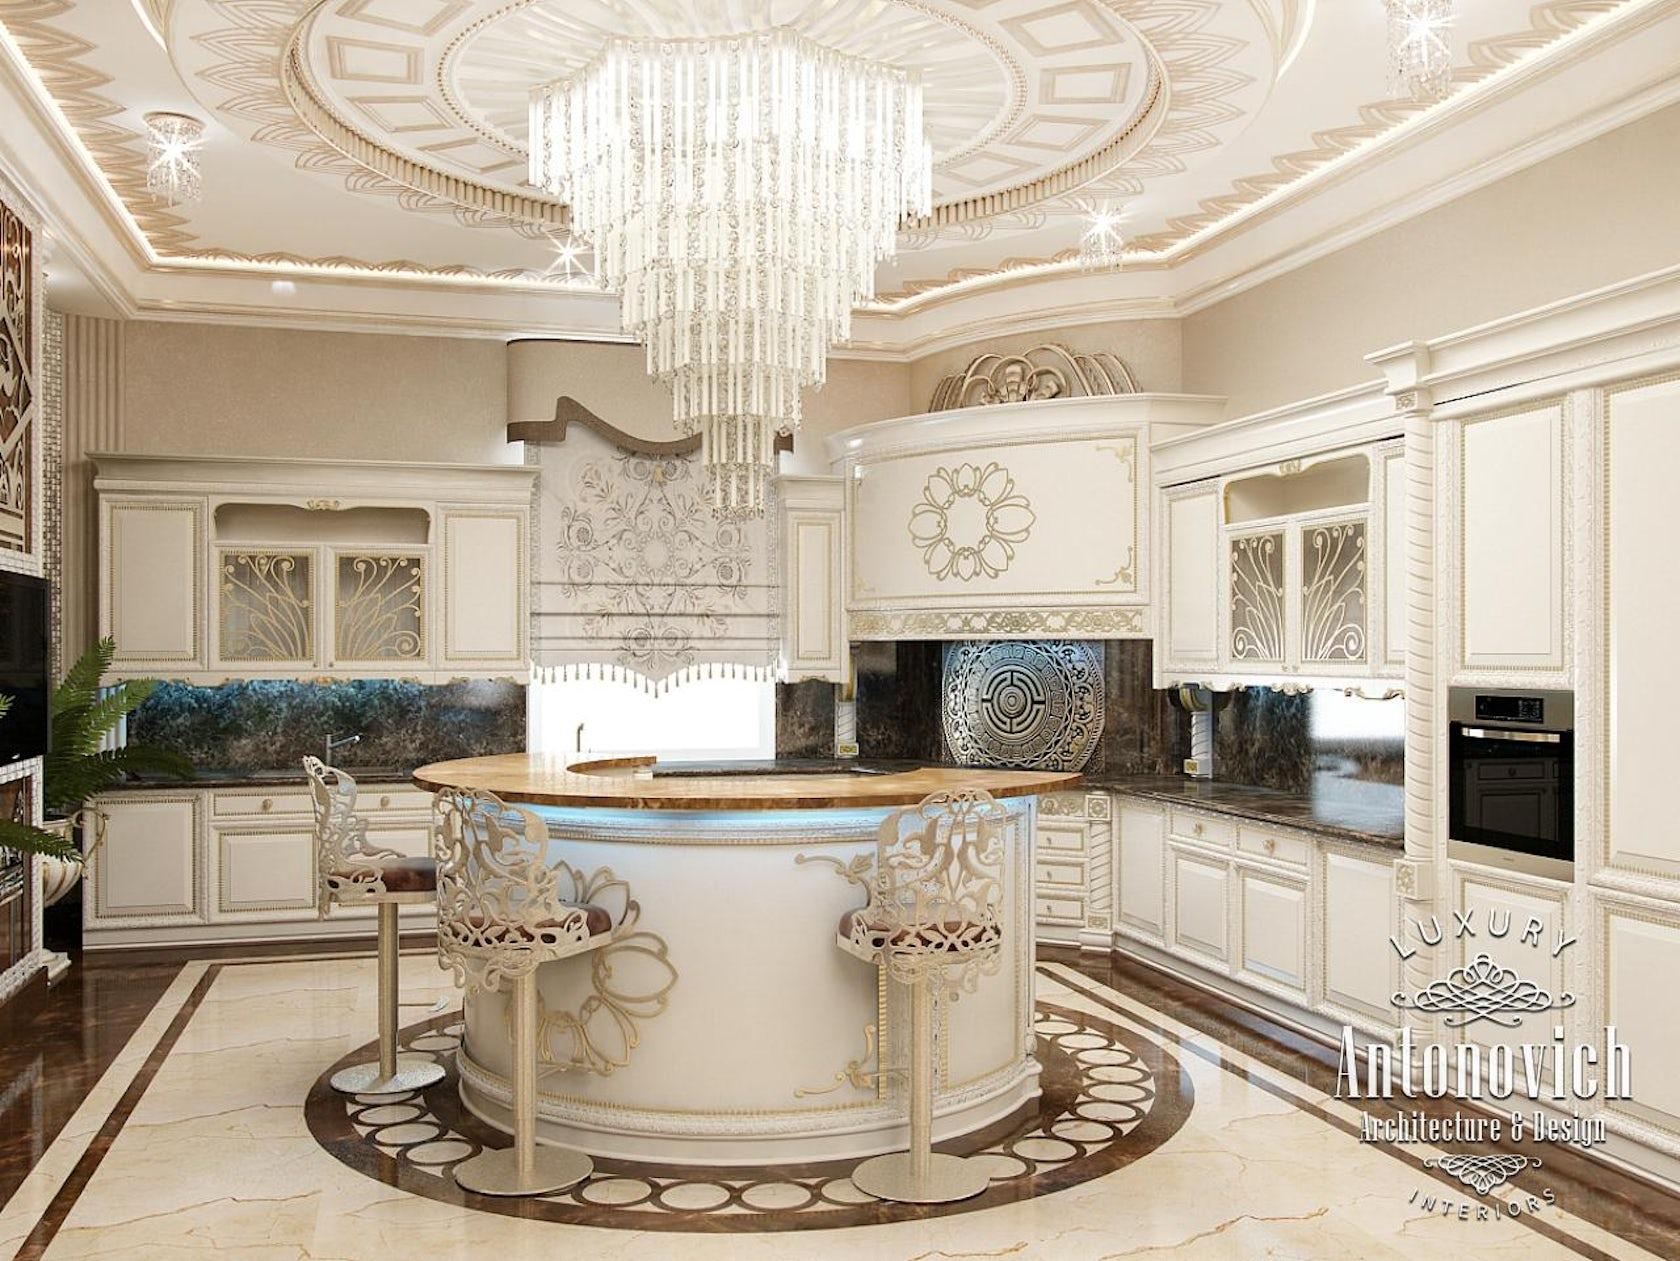 Kitchen dubai from luxury antonovich design architizer for Kitchen designs dubai